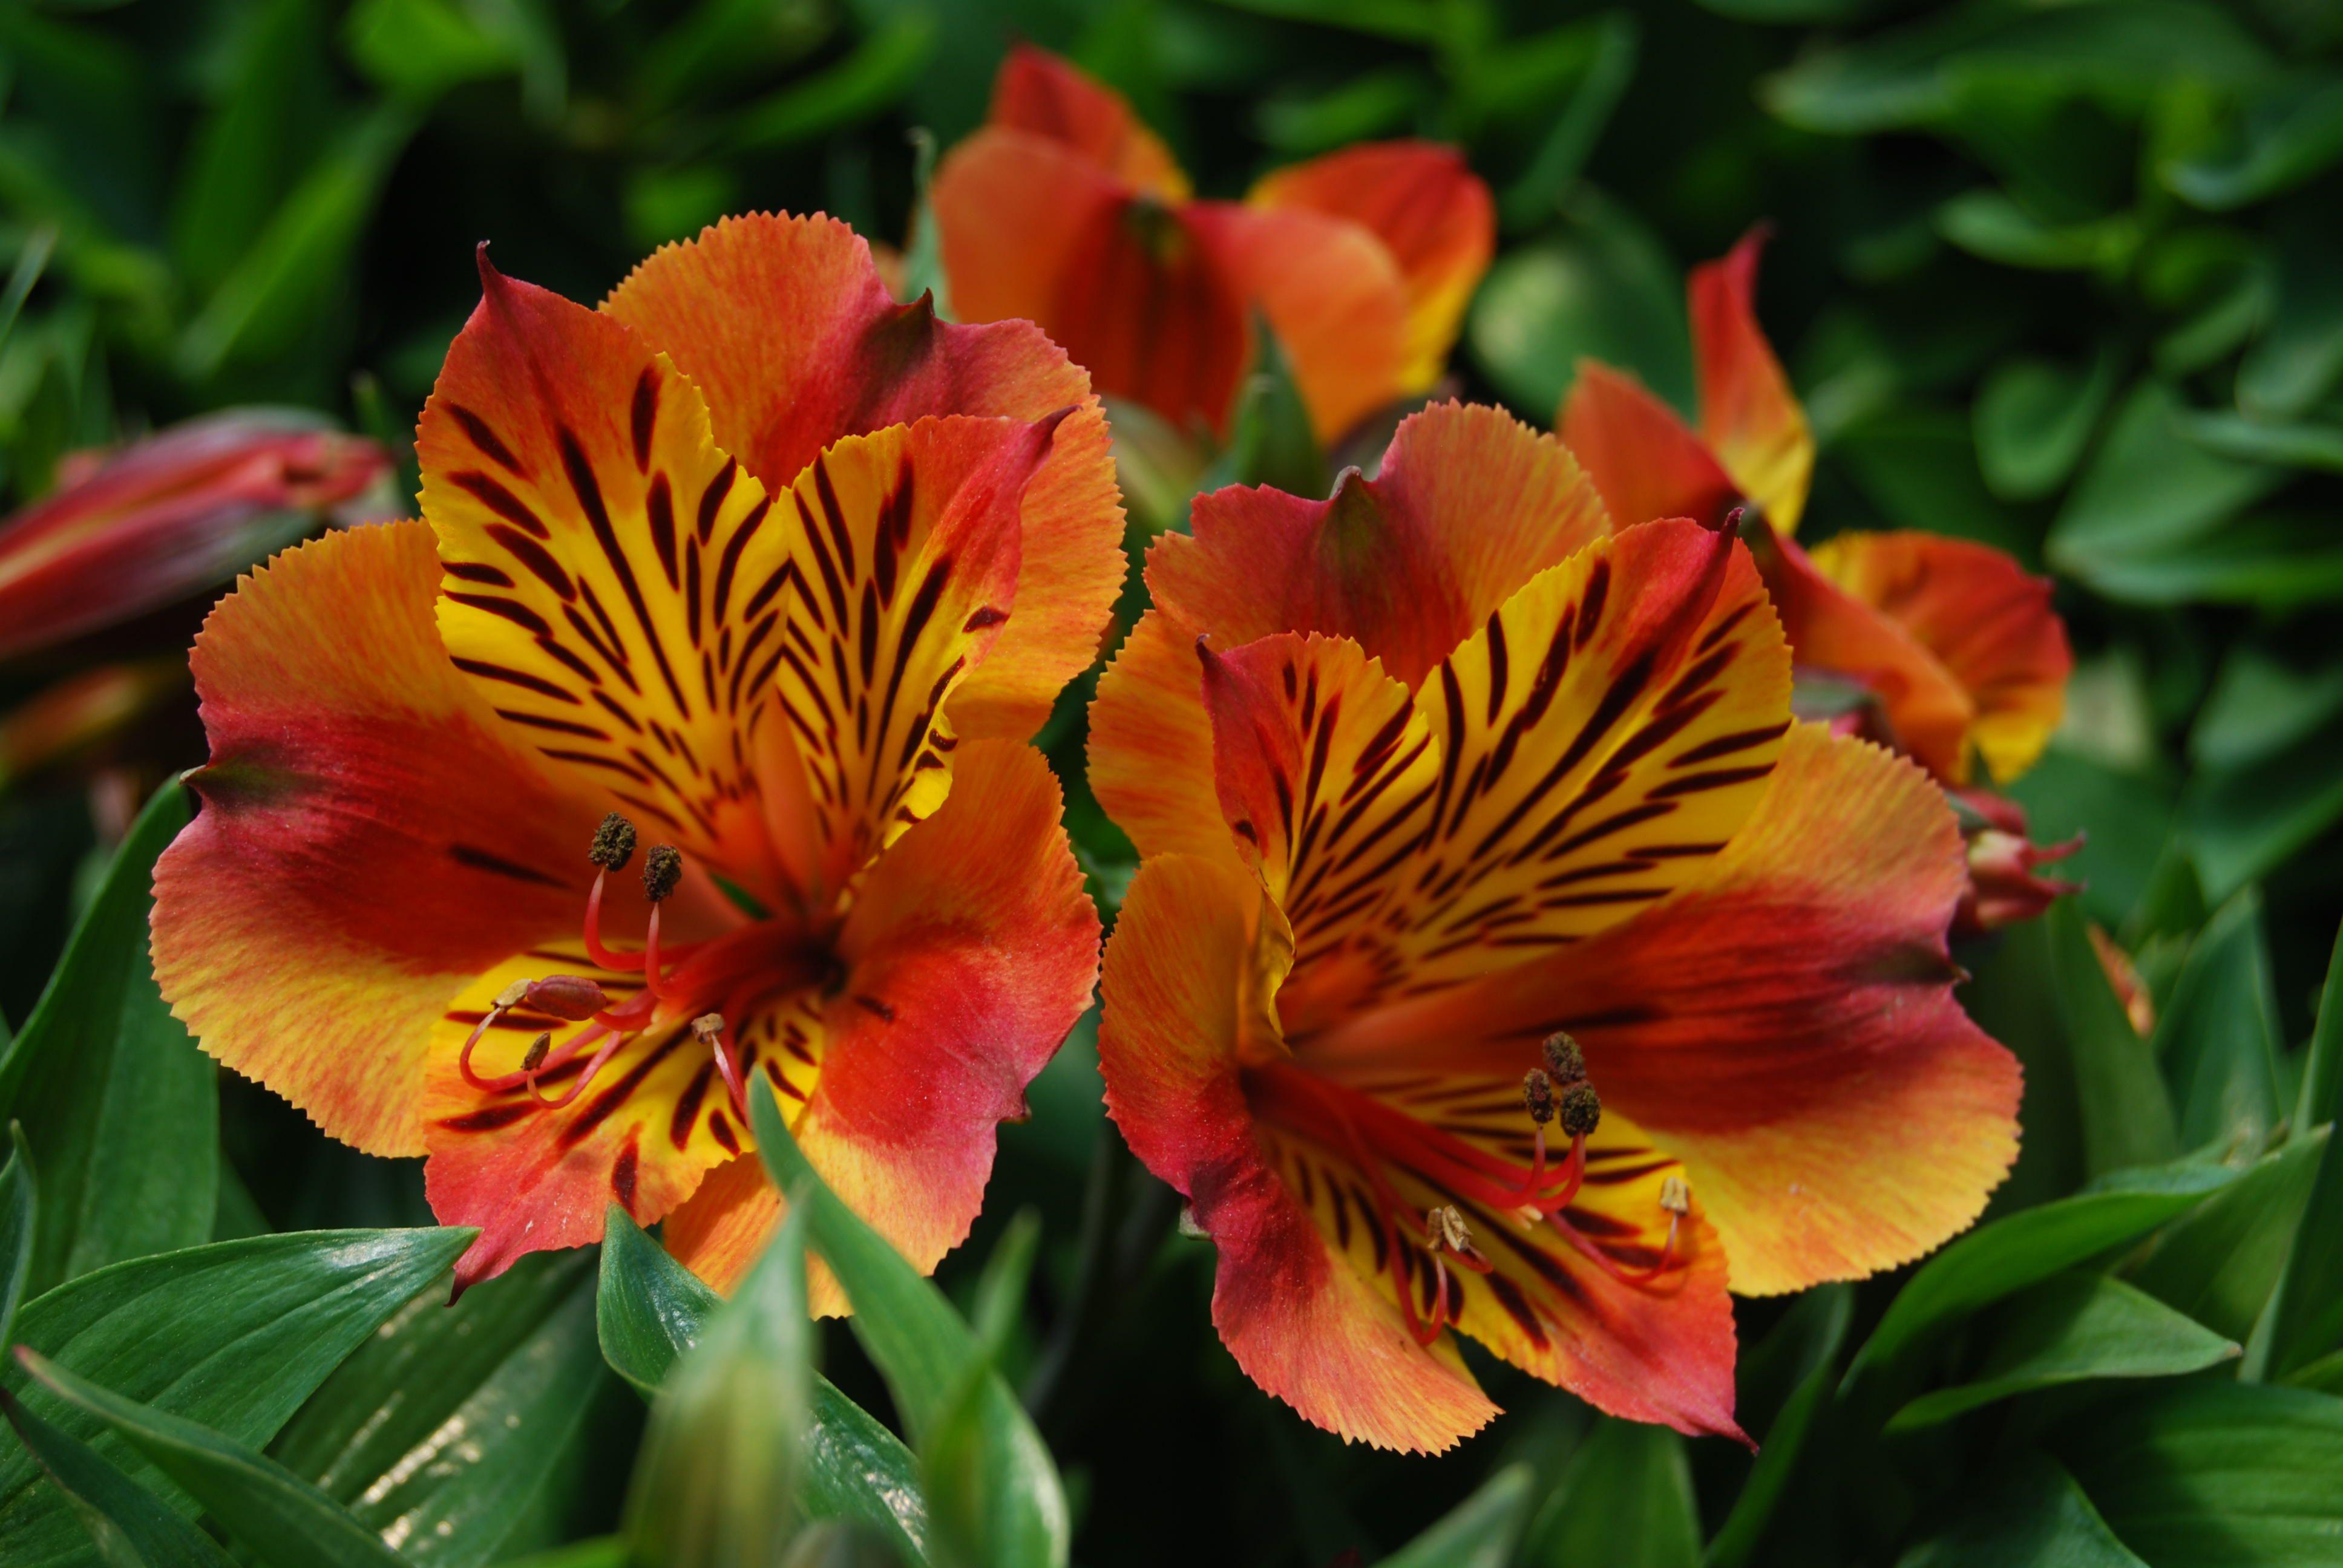 Alstroemeria peruvian lily flowers pinterest peruvian lilies alstroemeria peruvian lily izmirmasajfo